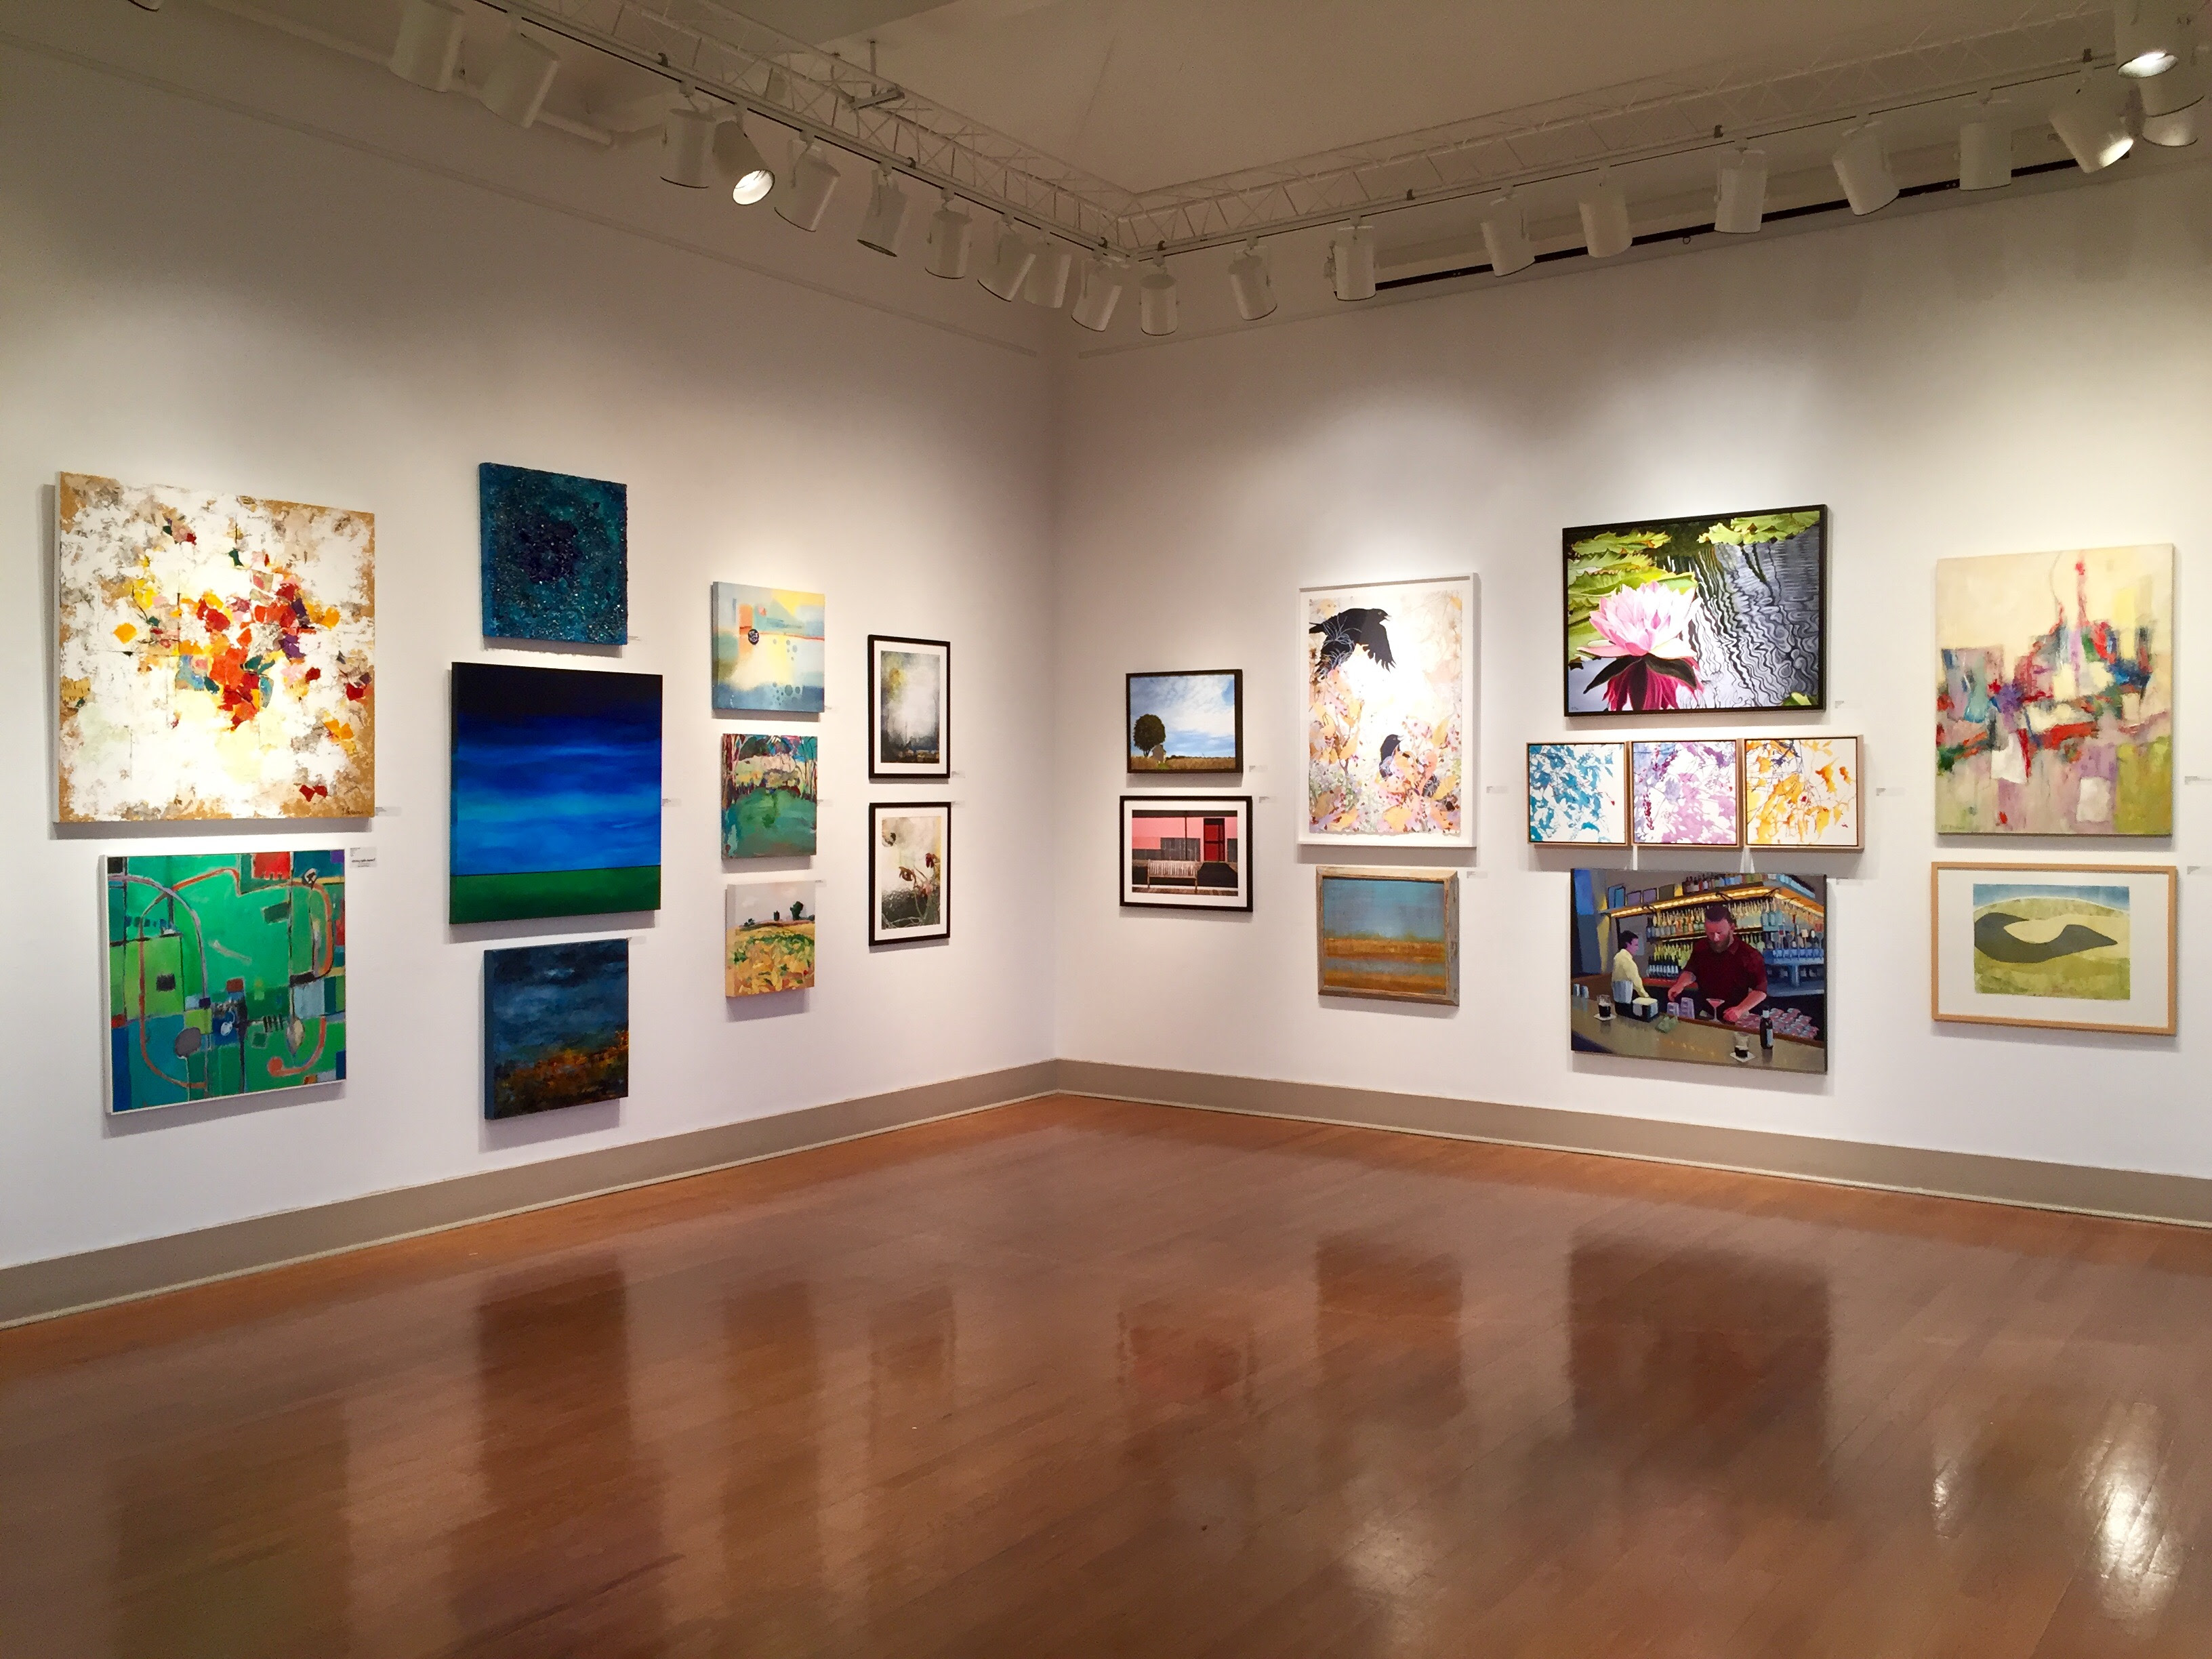 Curatorial Walkthrough Of Professional Artist Members Exhibition